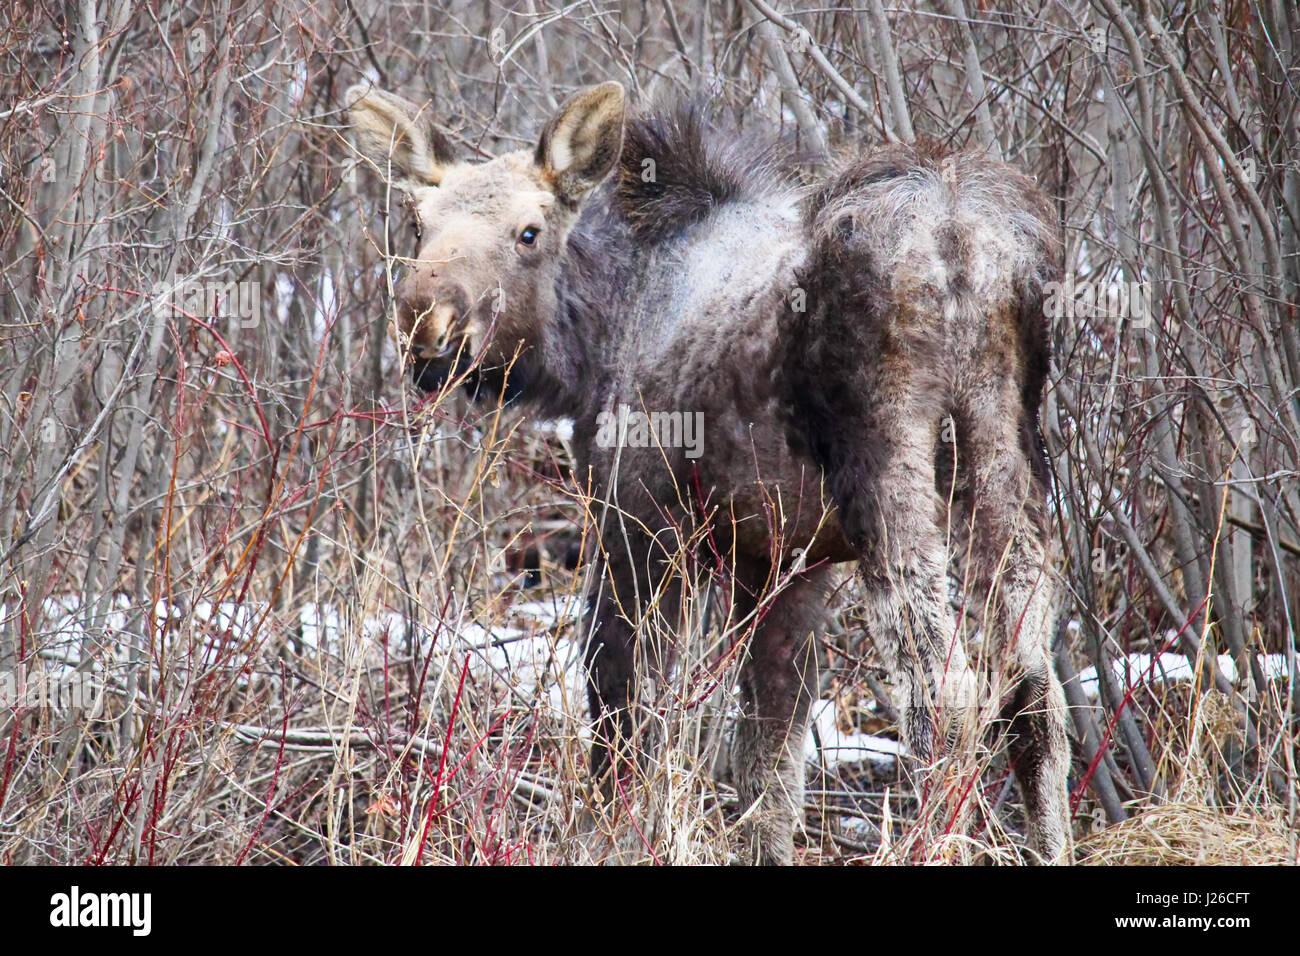 Orphaned moose calf shedding its winter coat. - Stock Image